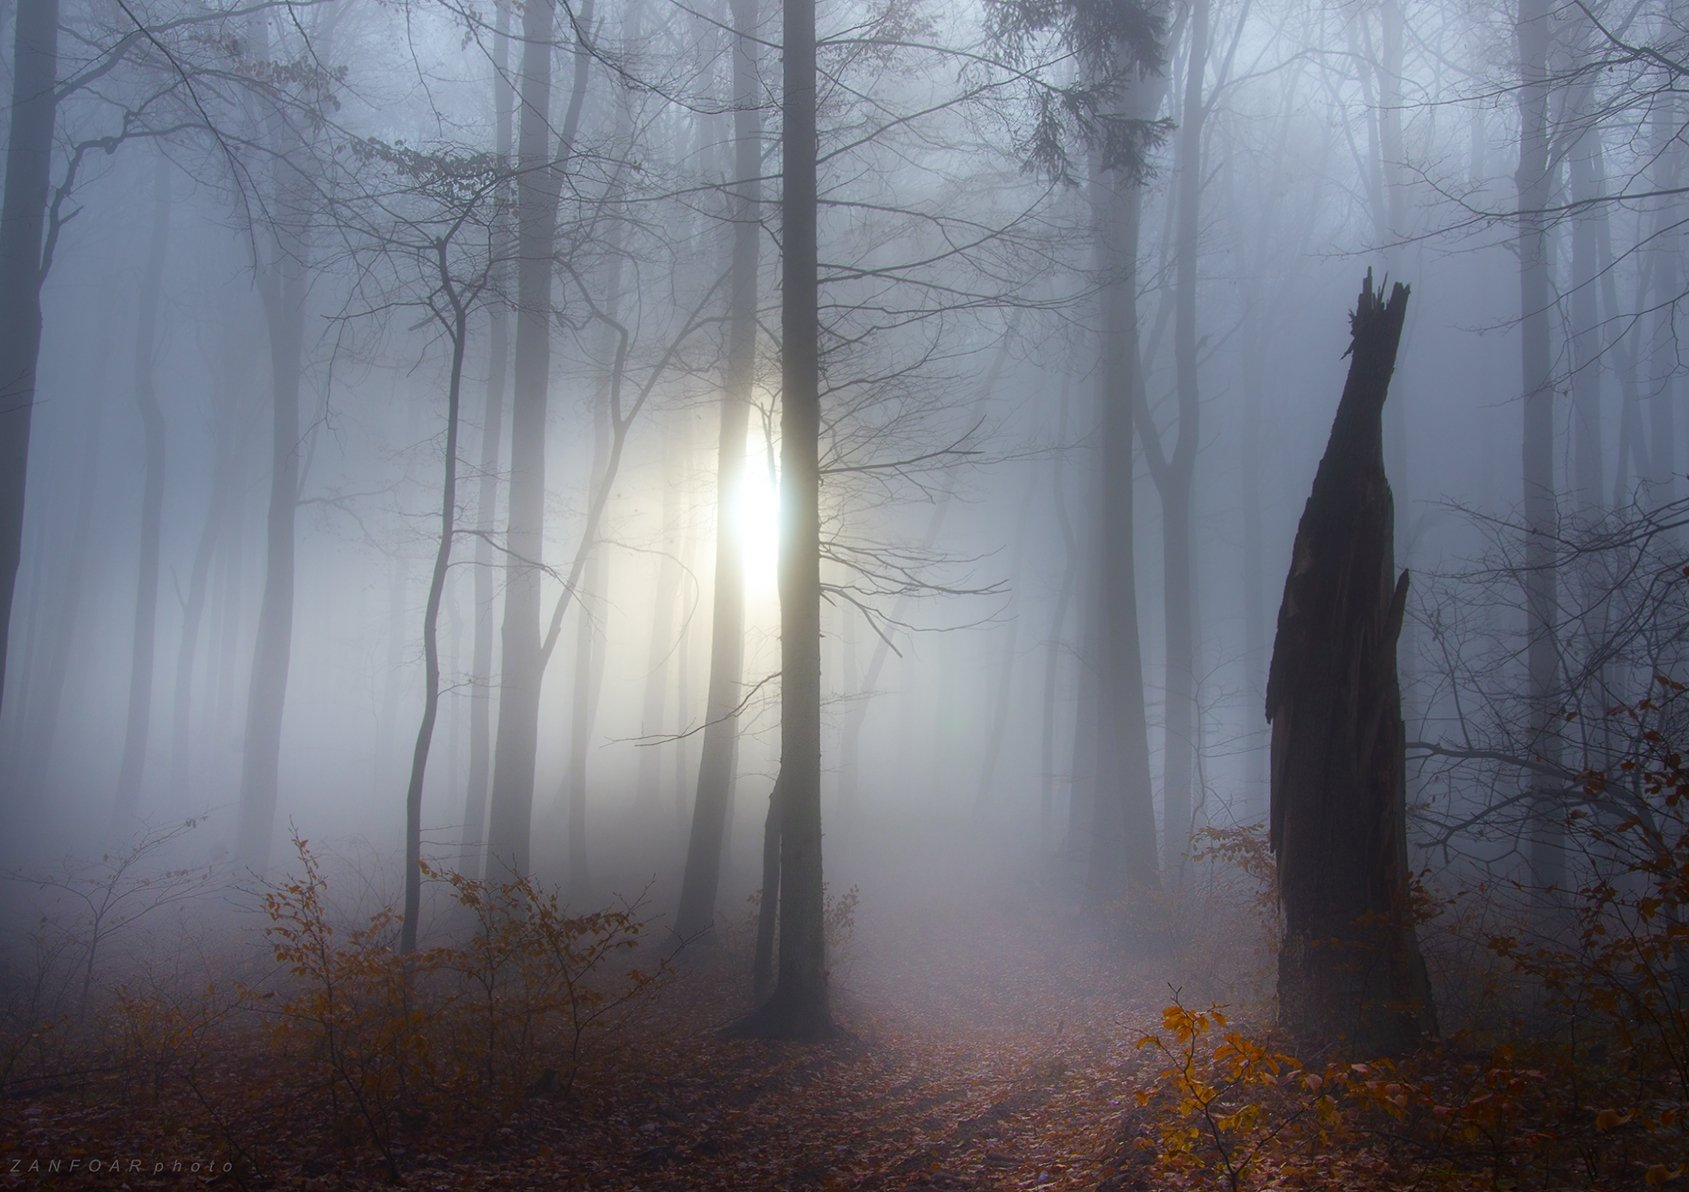 осень, туман, хриби,проникновение света,туман, вуаль, туман, лес, буки, осень, дымка, солнце,zanfoar,czech republic, Zanfoar